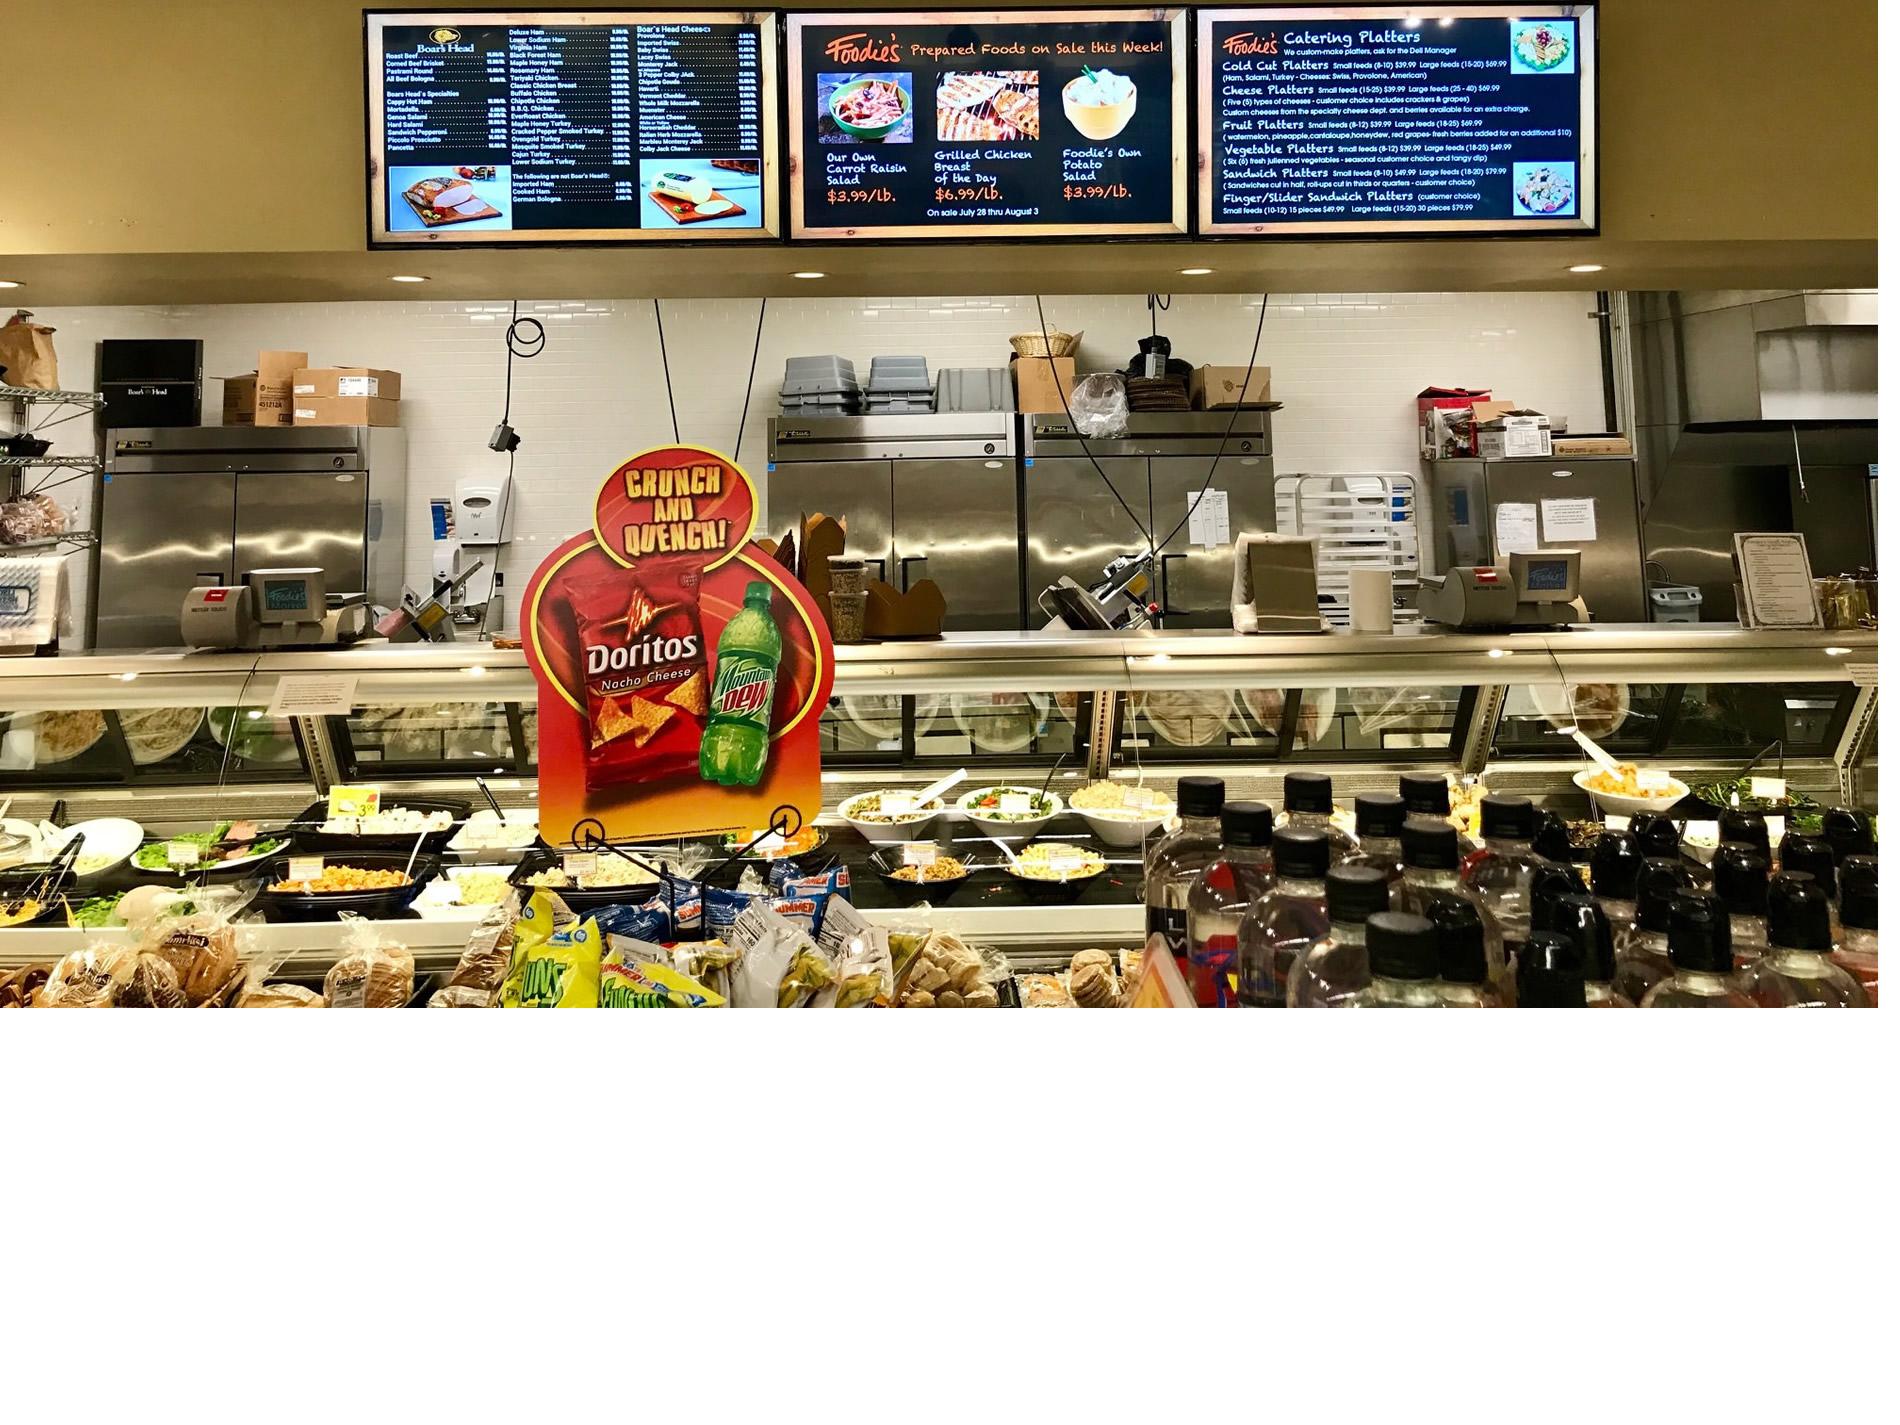 Foodies_Markets_South_Boston_17